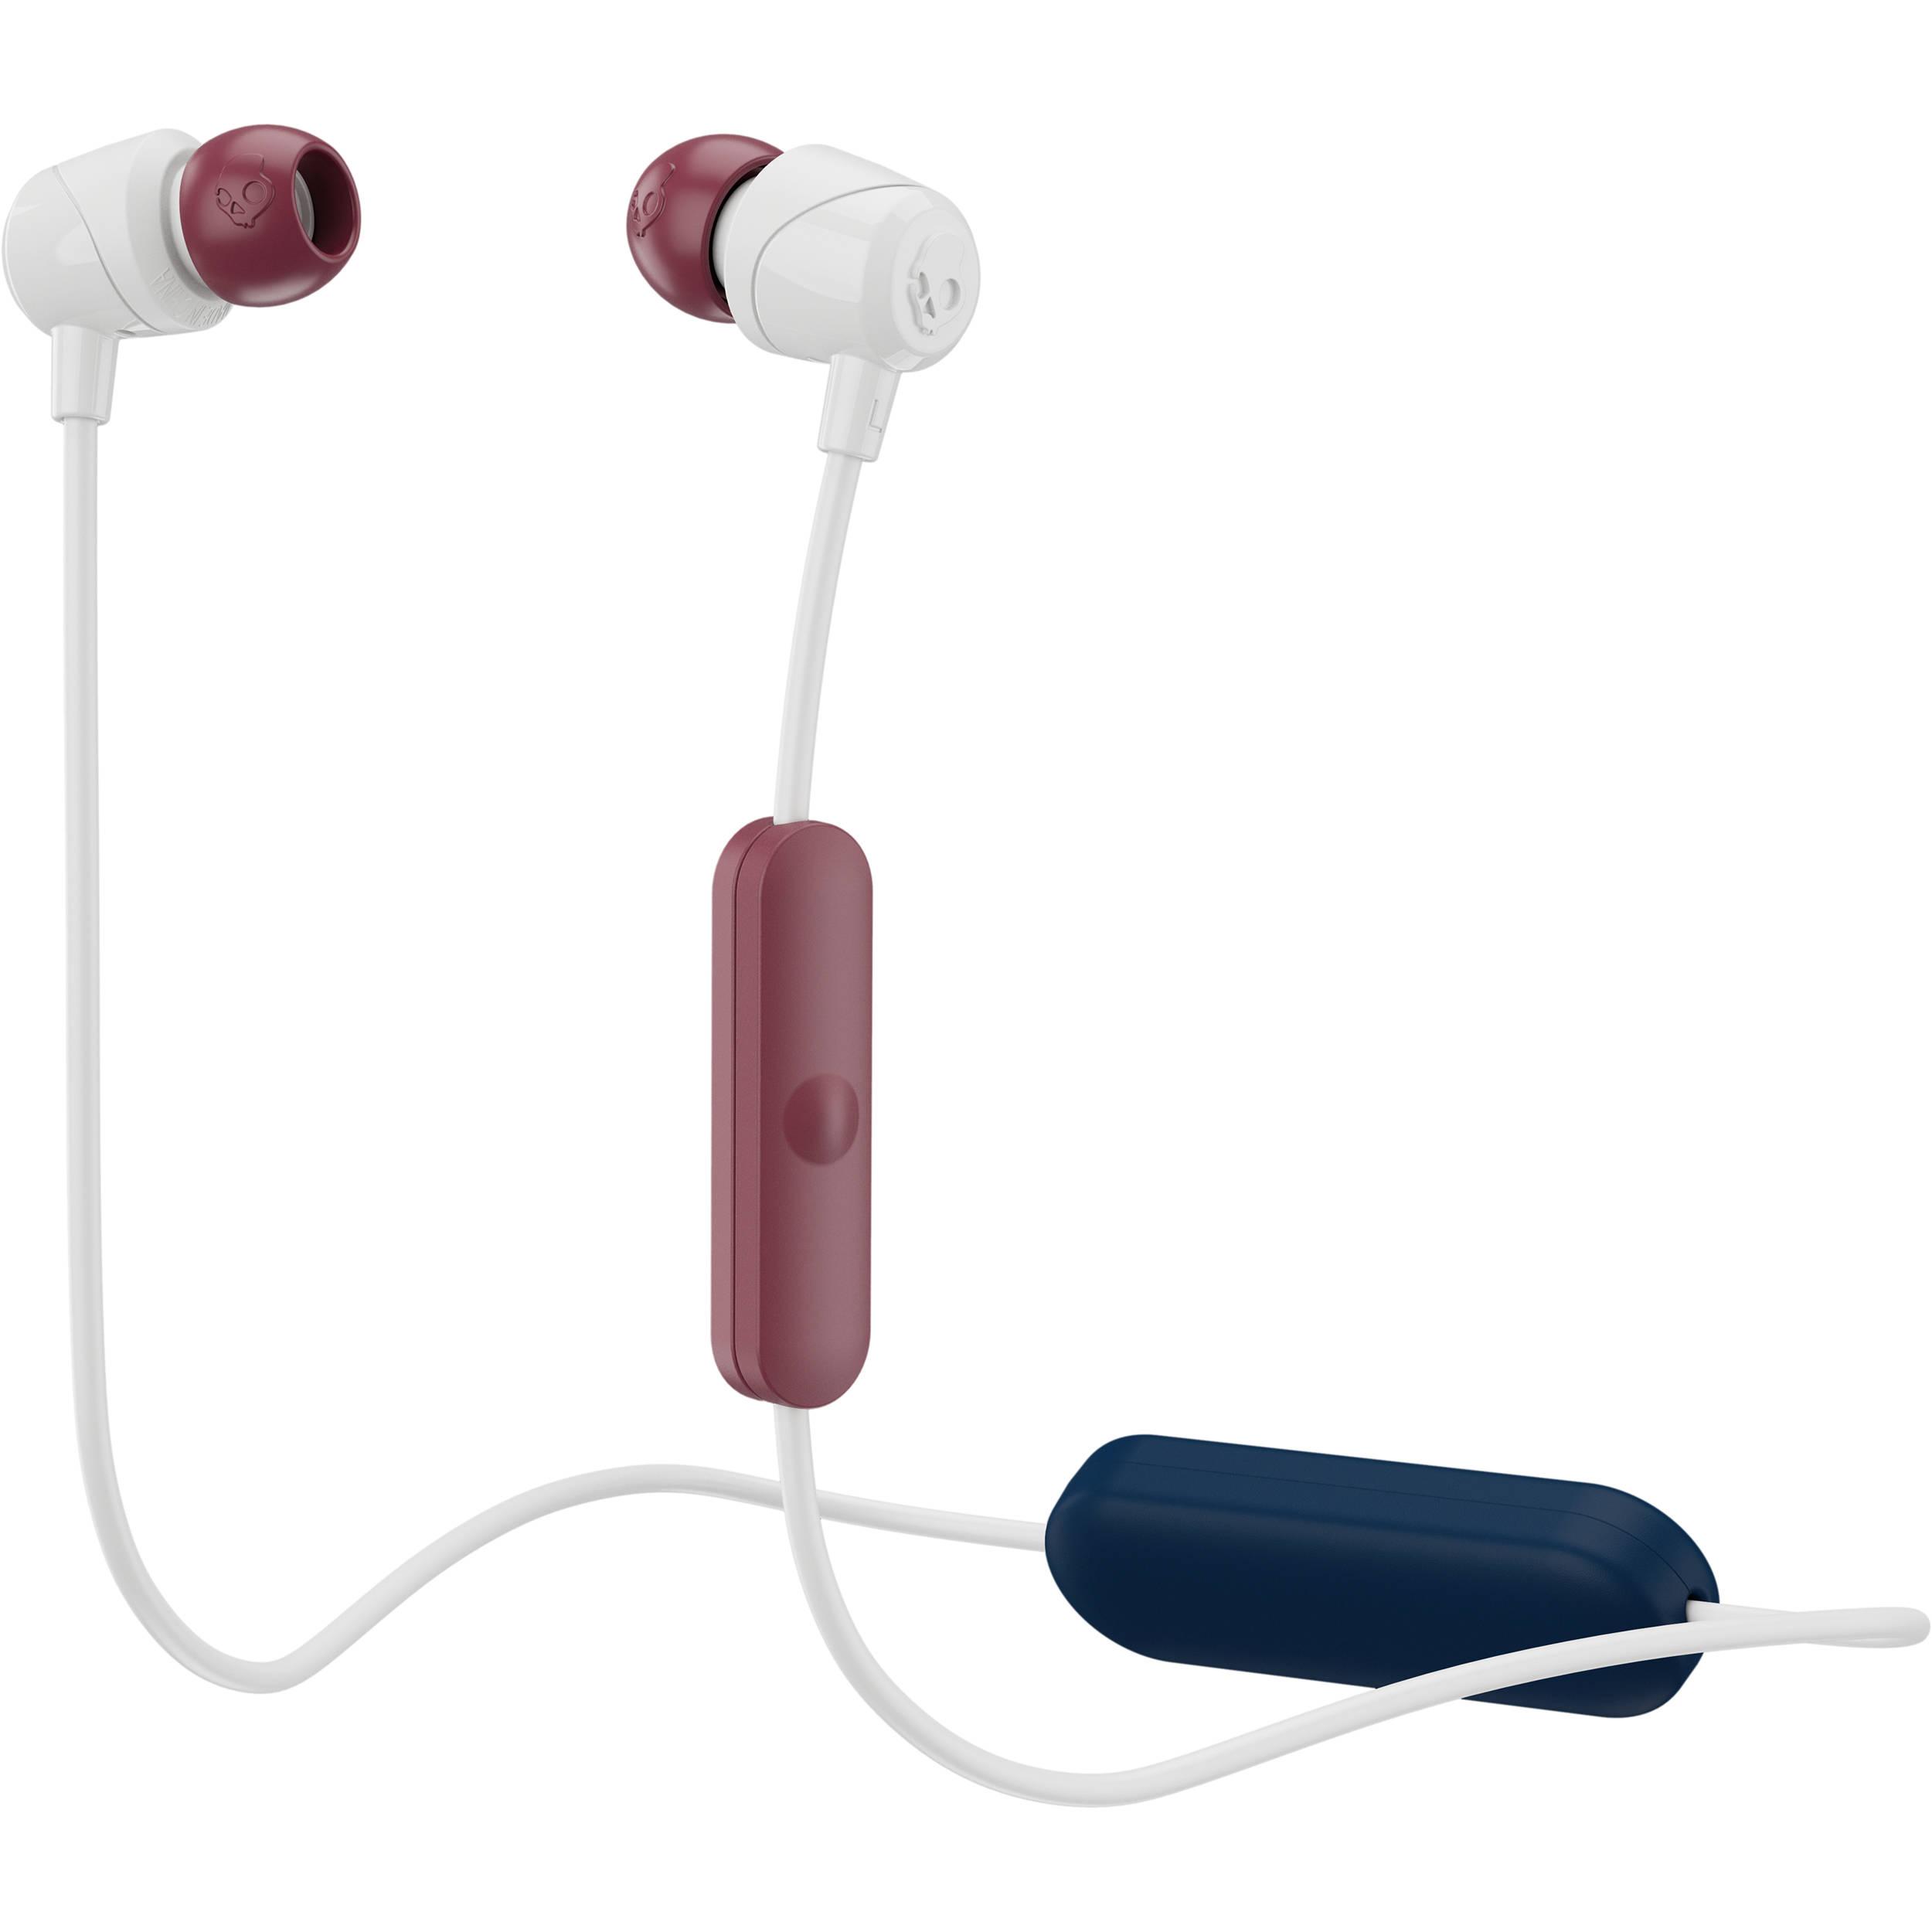 664572a2125 Skullcandy Jib Wireless Earbuds (Vice Gray Crimson) S2DUW-L677